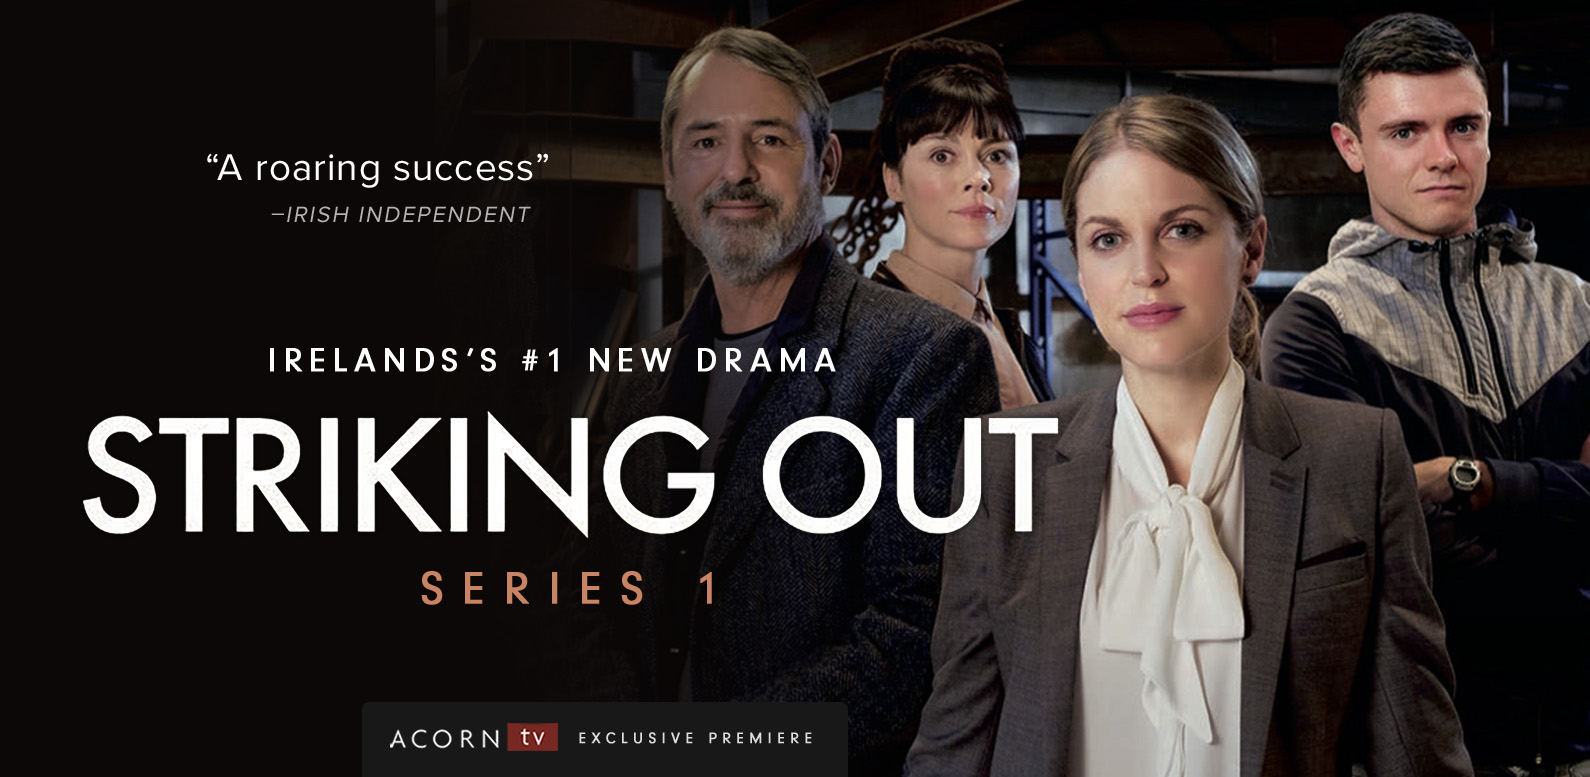 Striking Out, An Acorn TV Original | Kings River Life Magazine